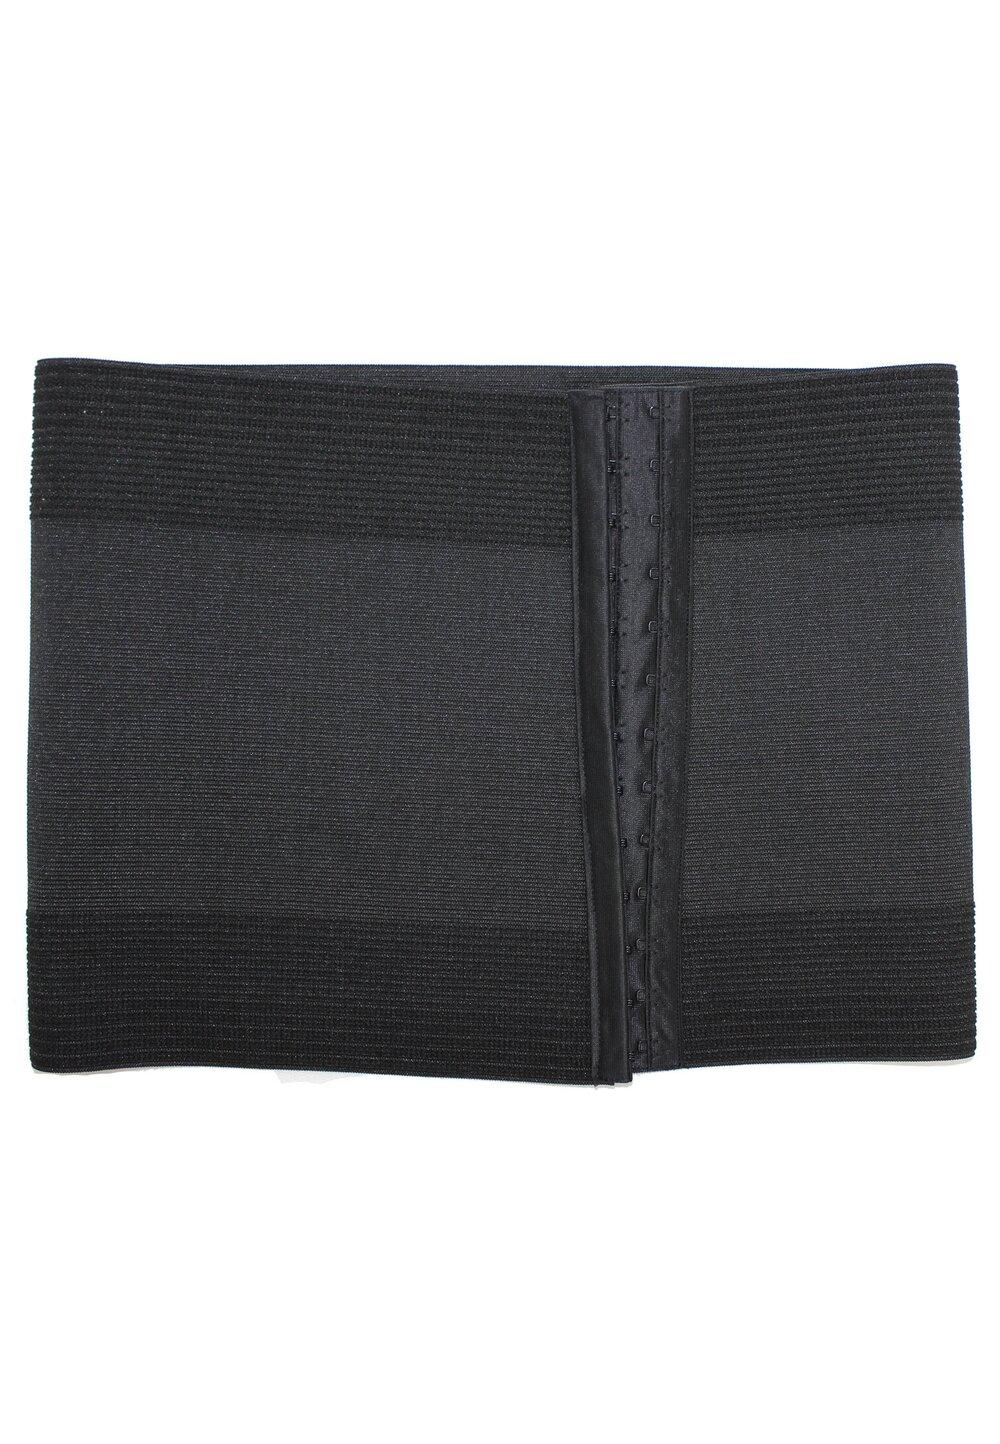 Centura Hana, neagra imagine